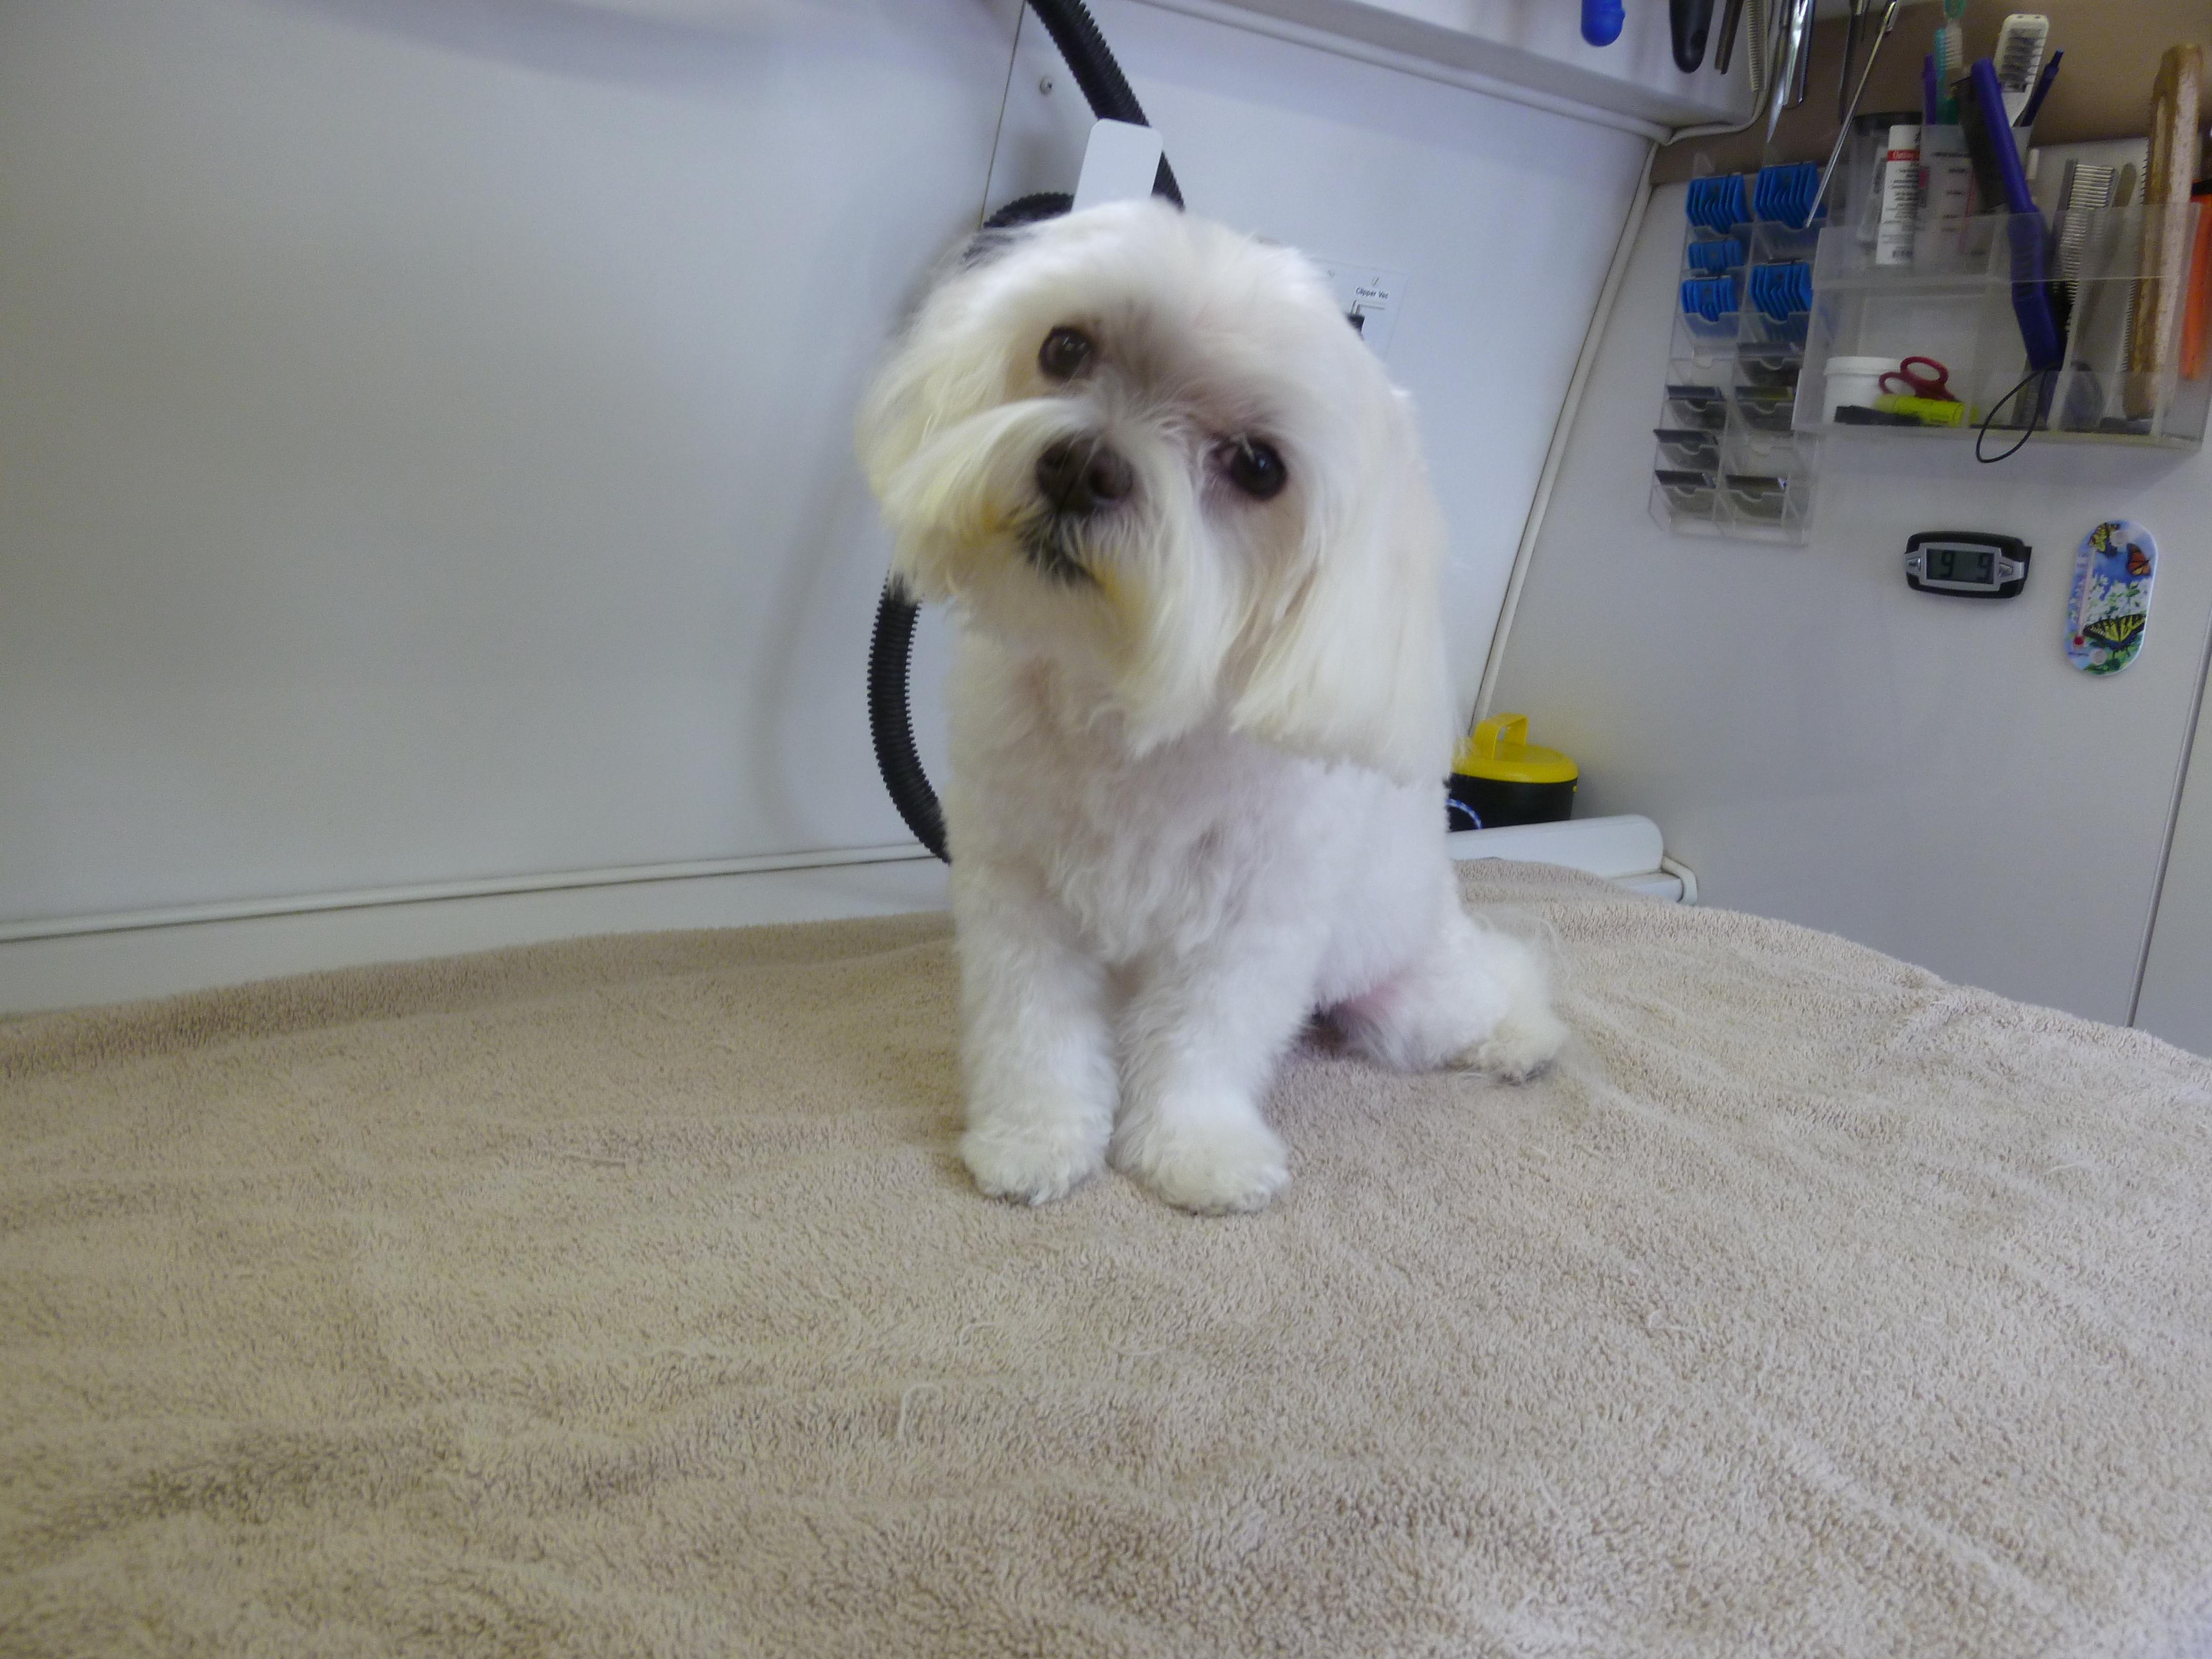 Angelas pet styling mobile grooming salon img1695 solutioingenieria Choice Image